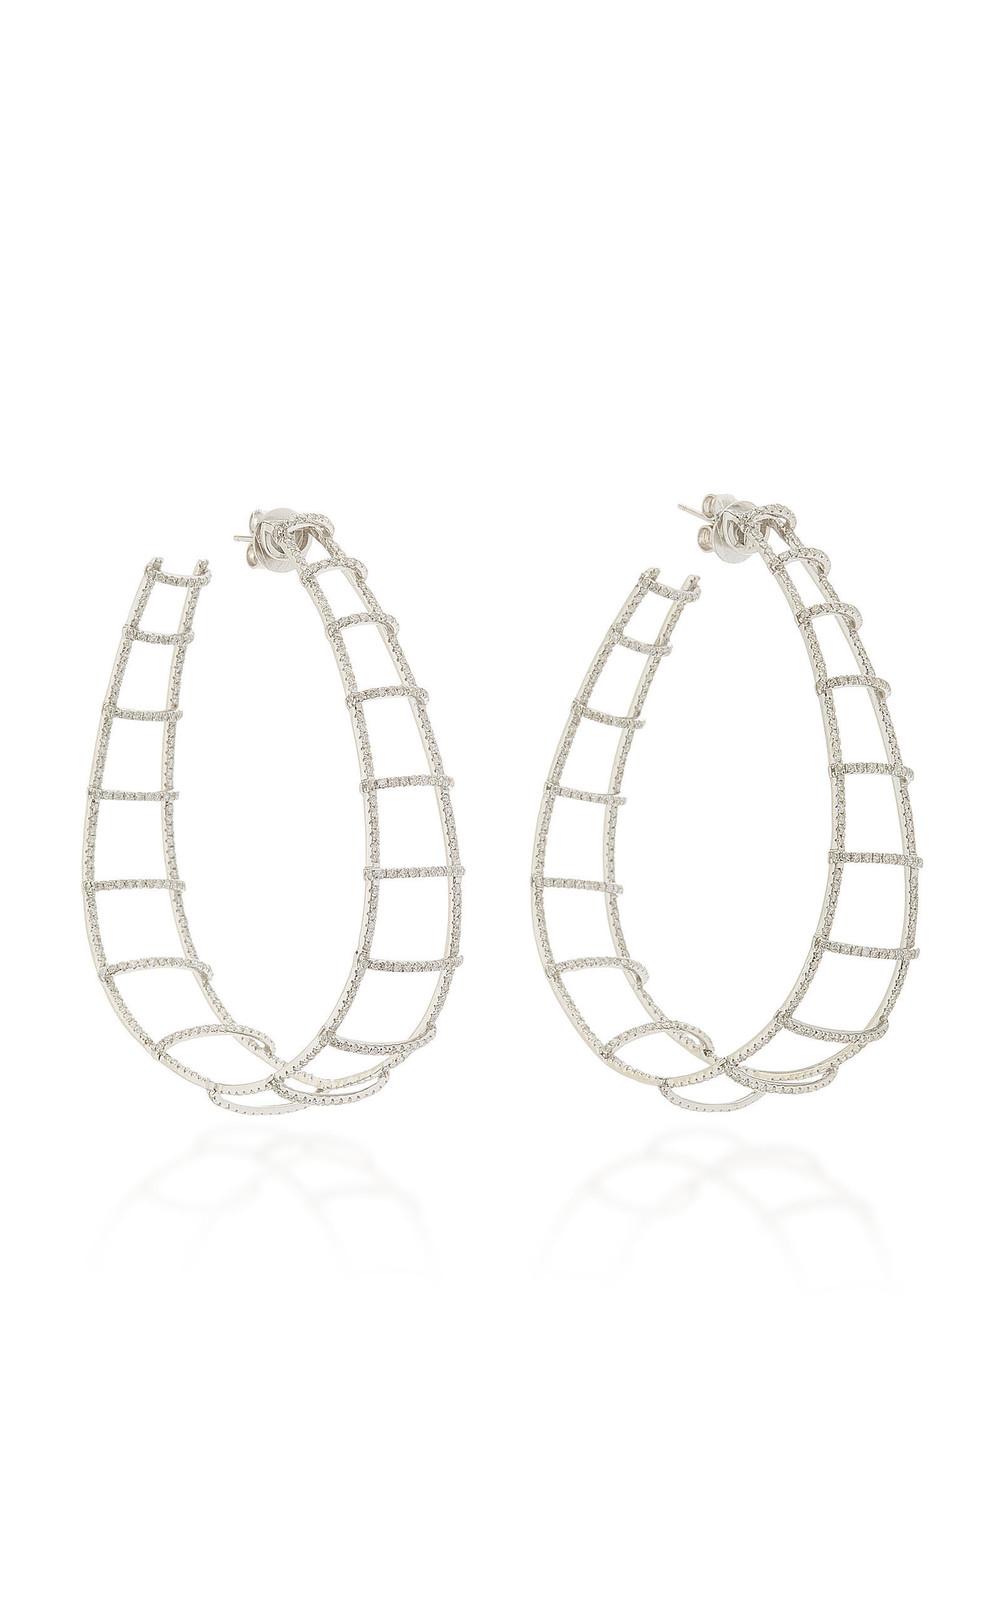 Ofira Diamond Ladder Hoop Earrings in gold